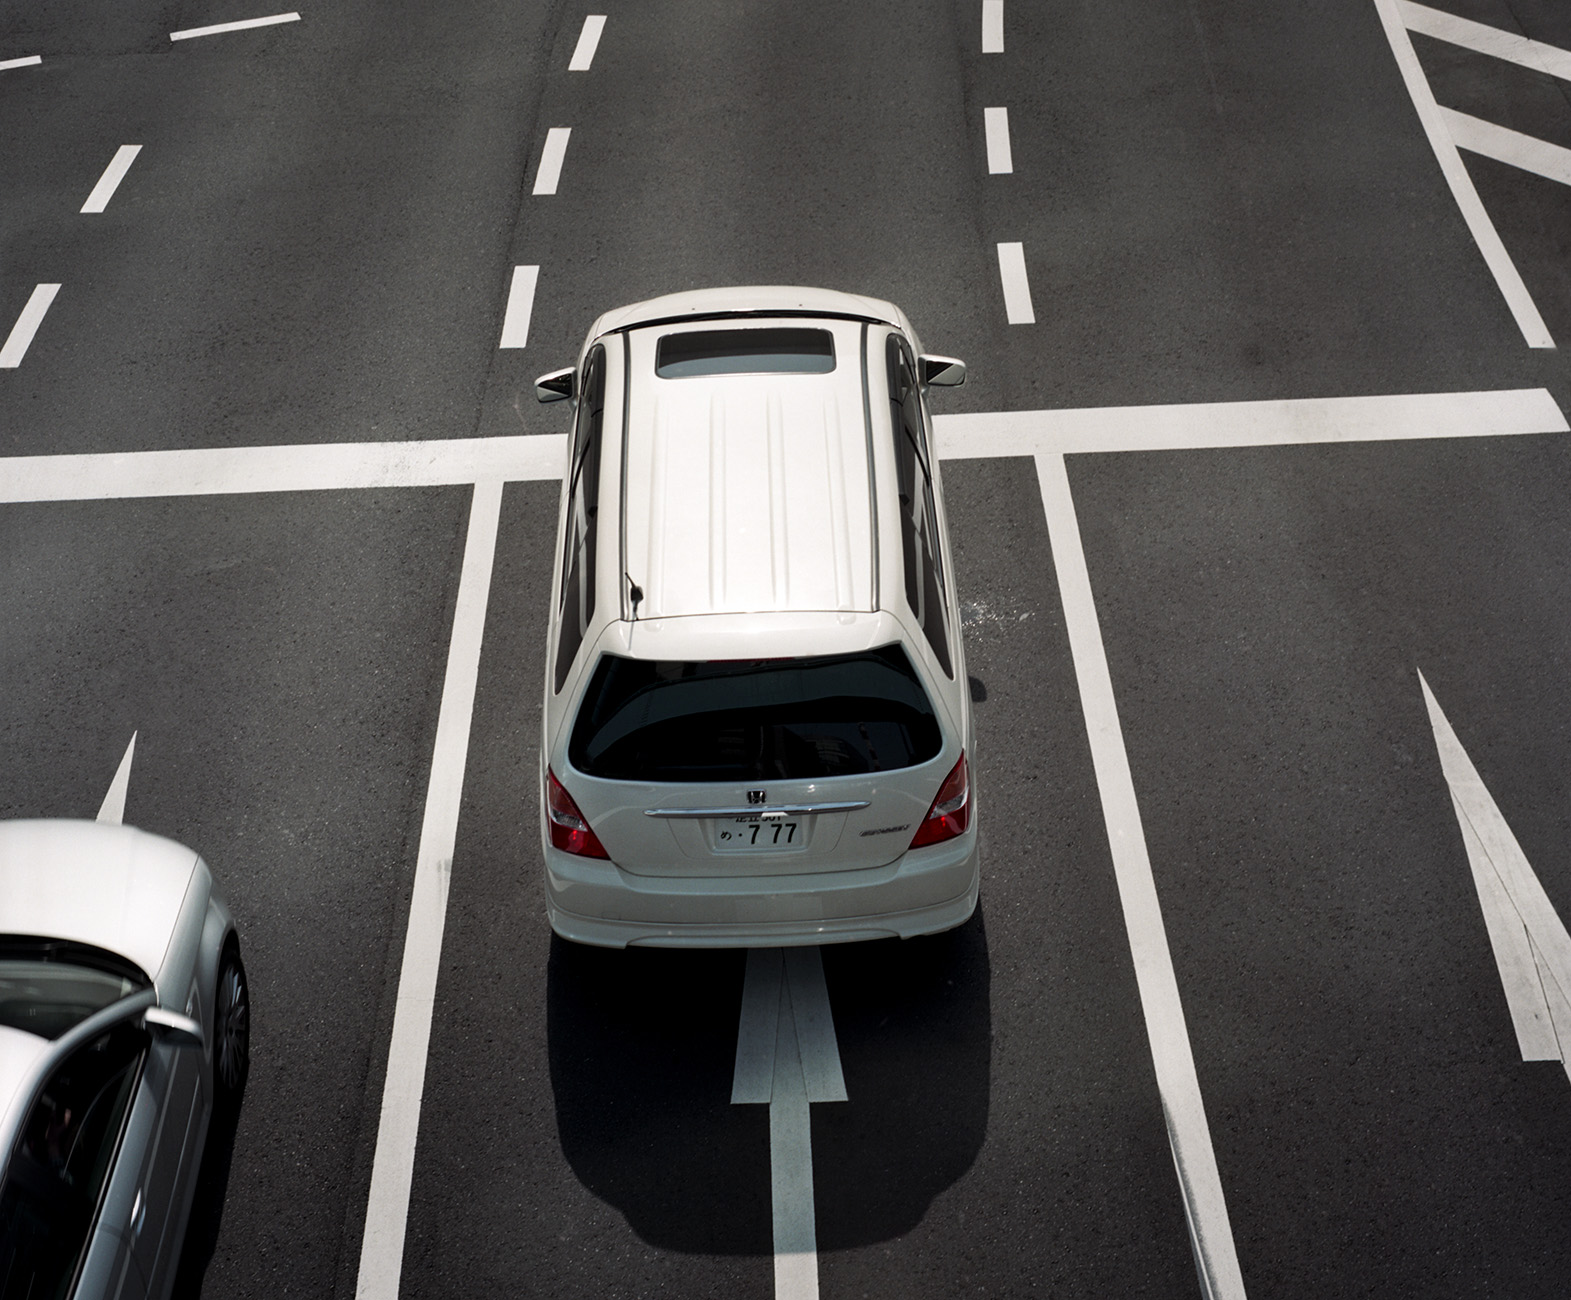 Bil från bro copy.jpg